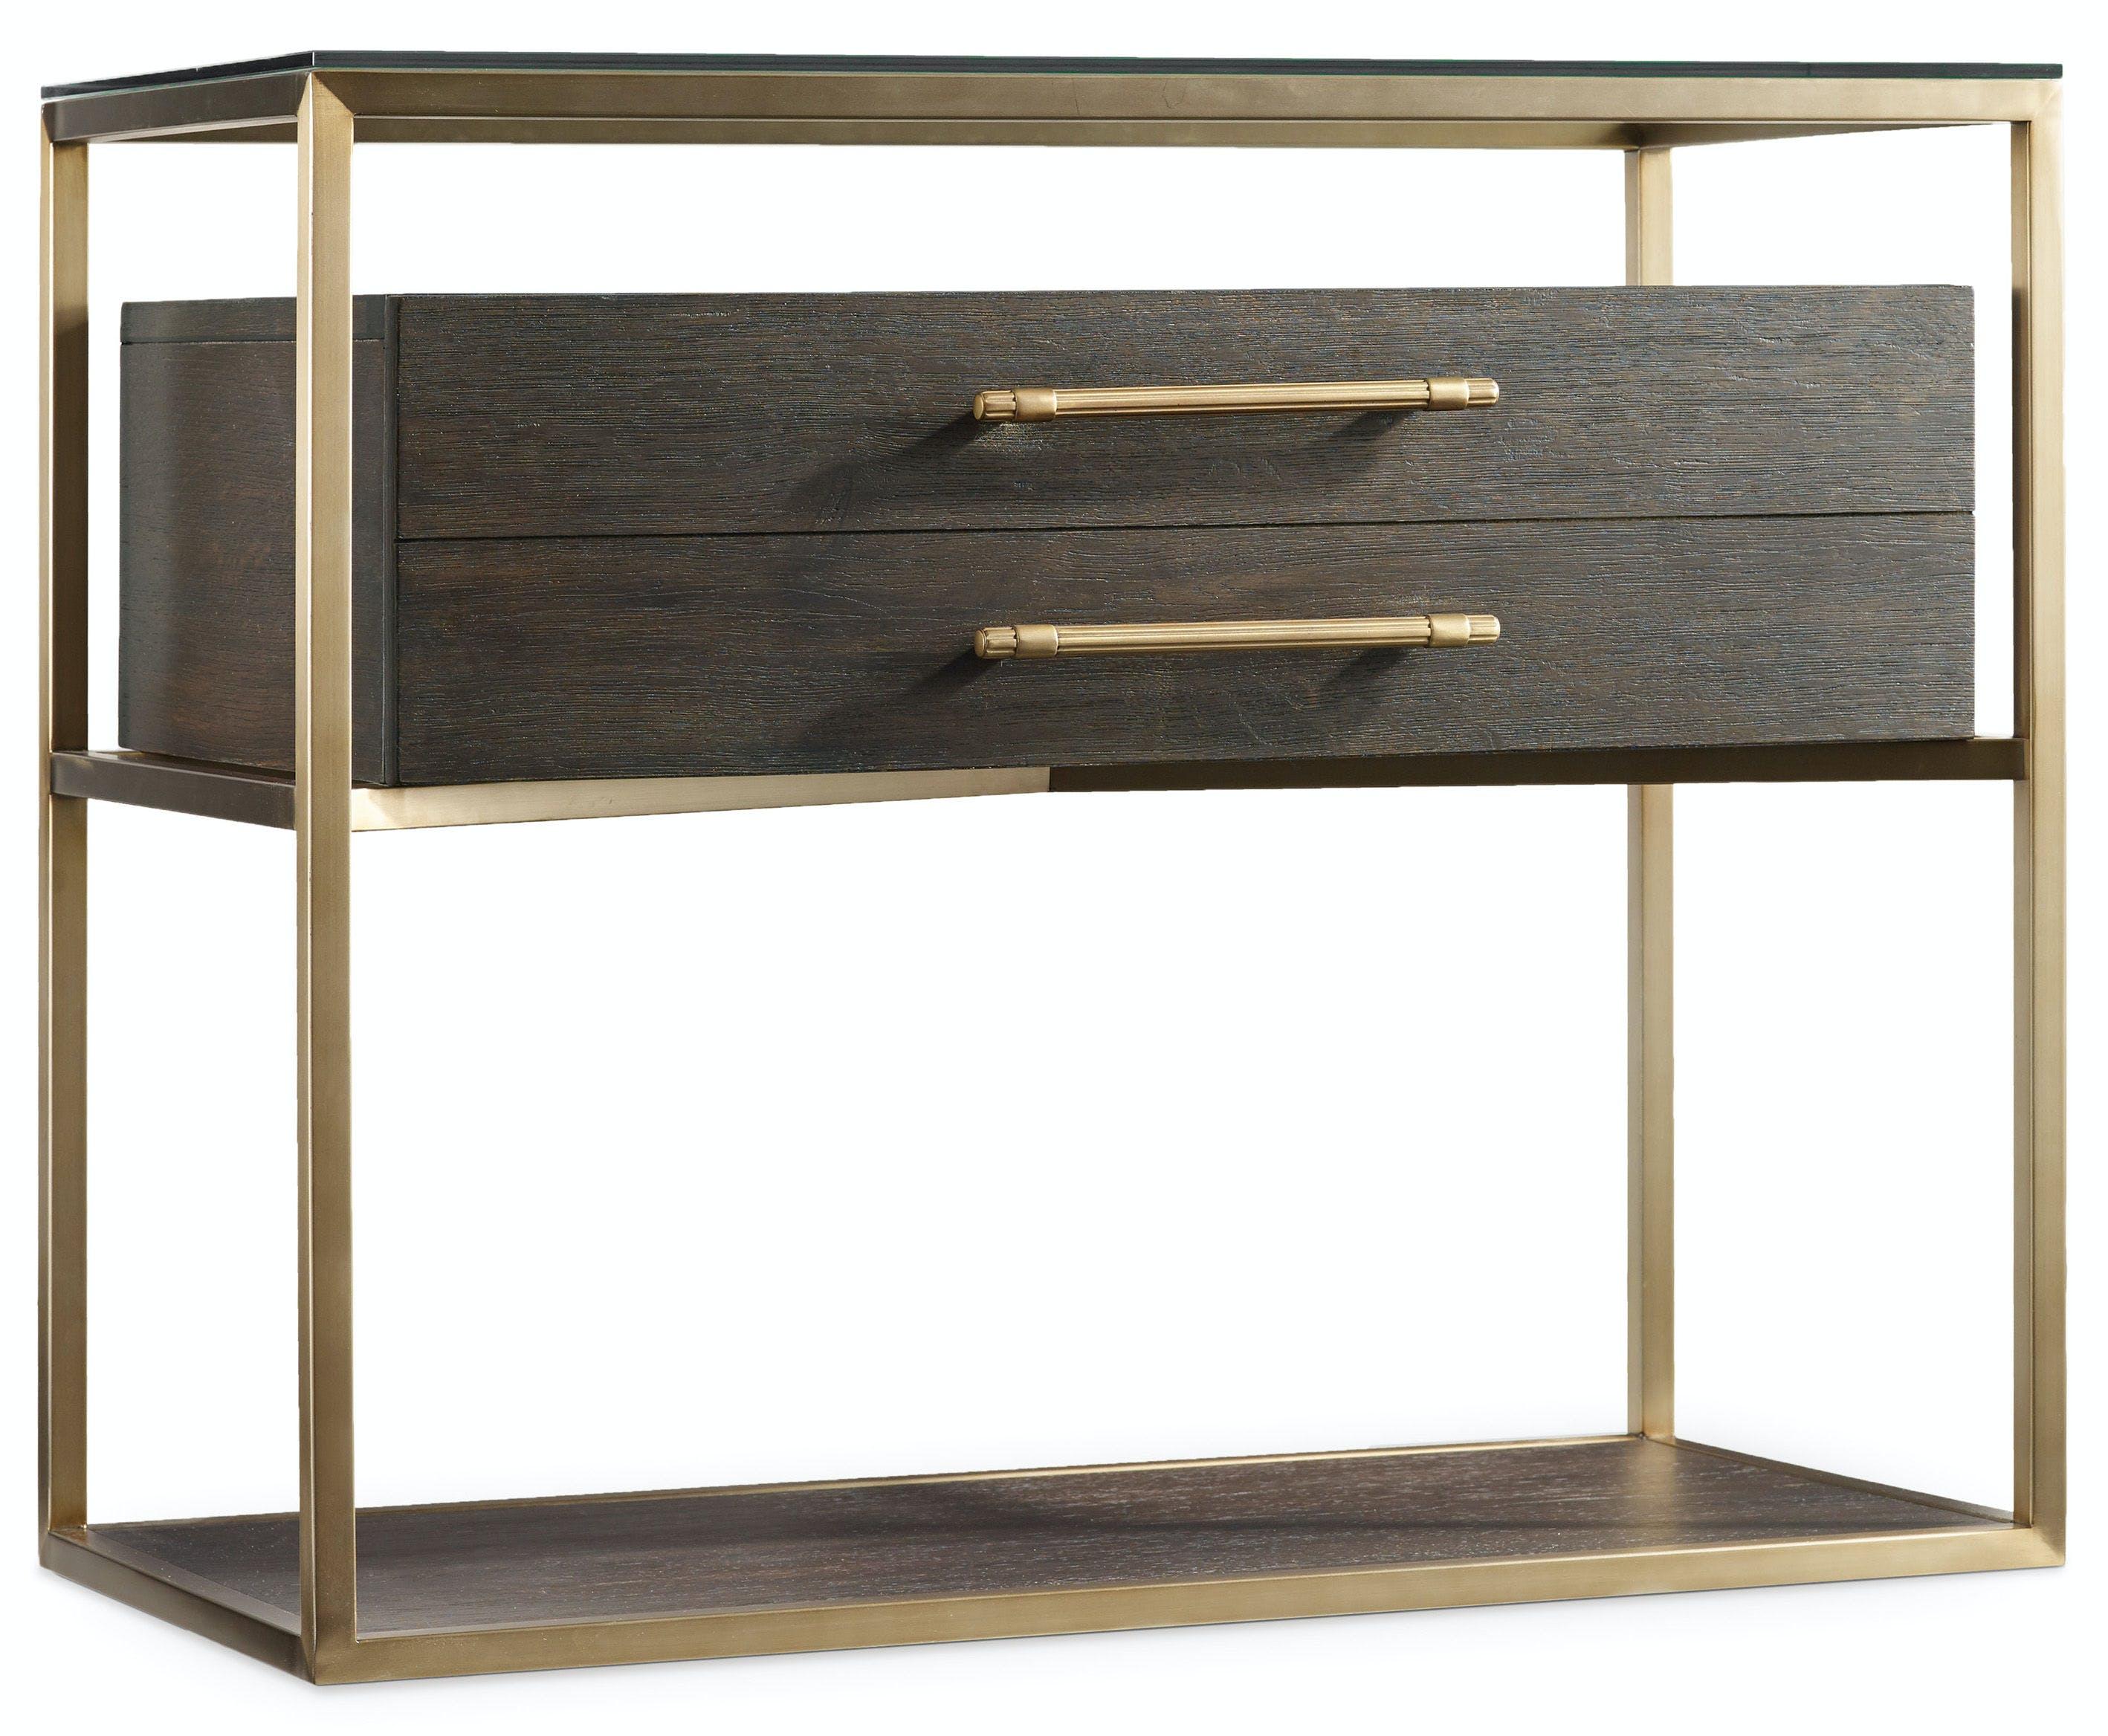 Hooker Furniture Bedroom Curata One Drawer Nightstand 1600